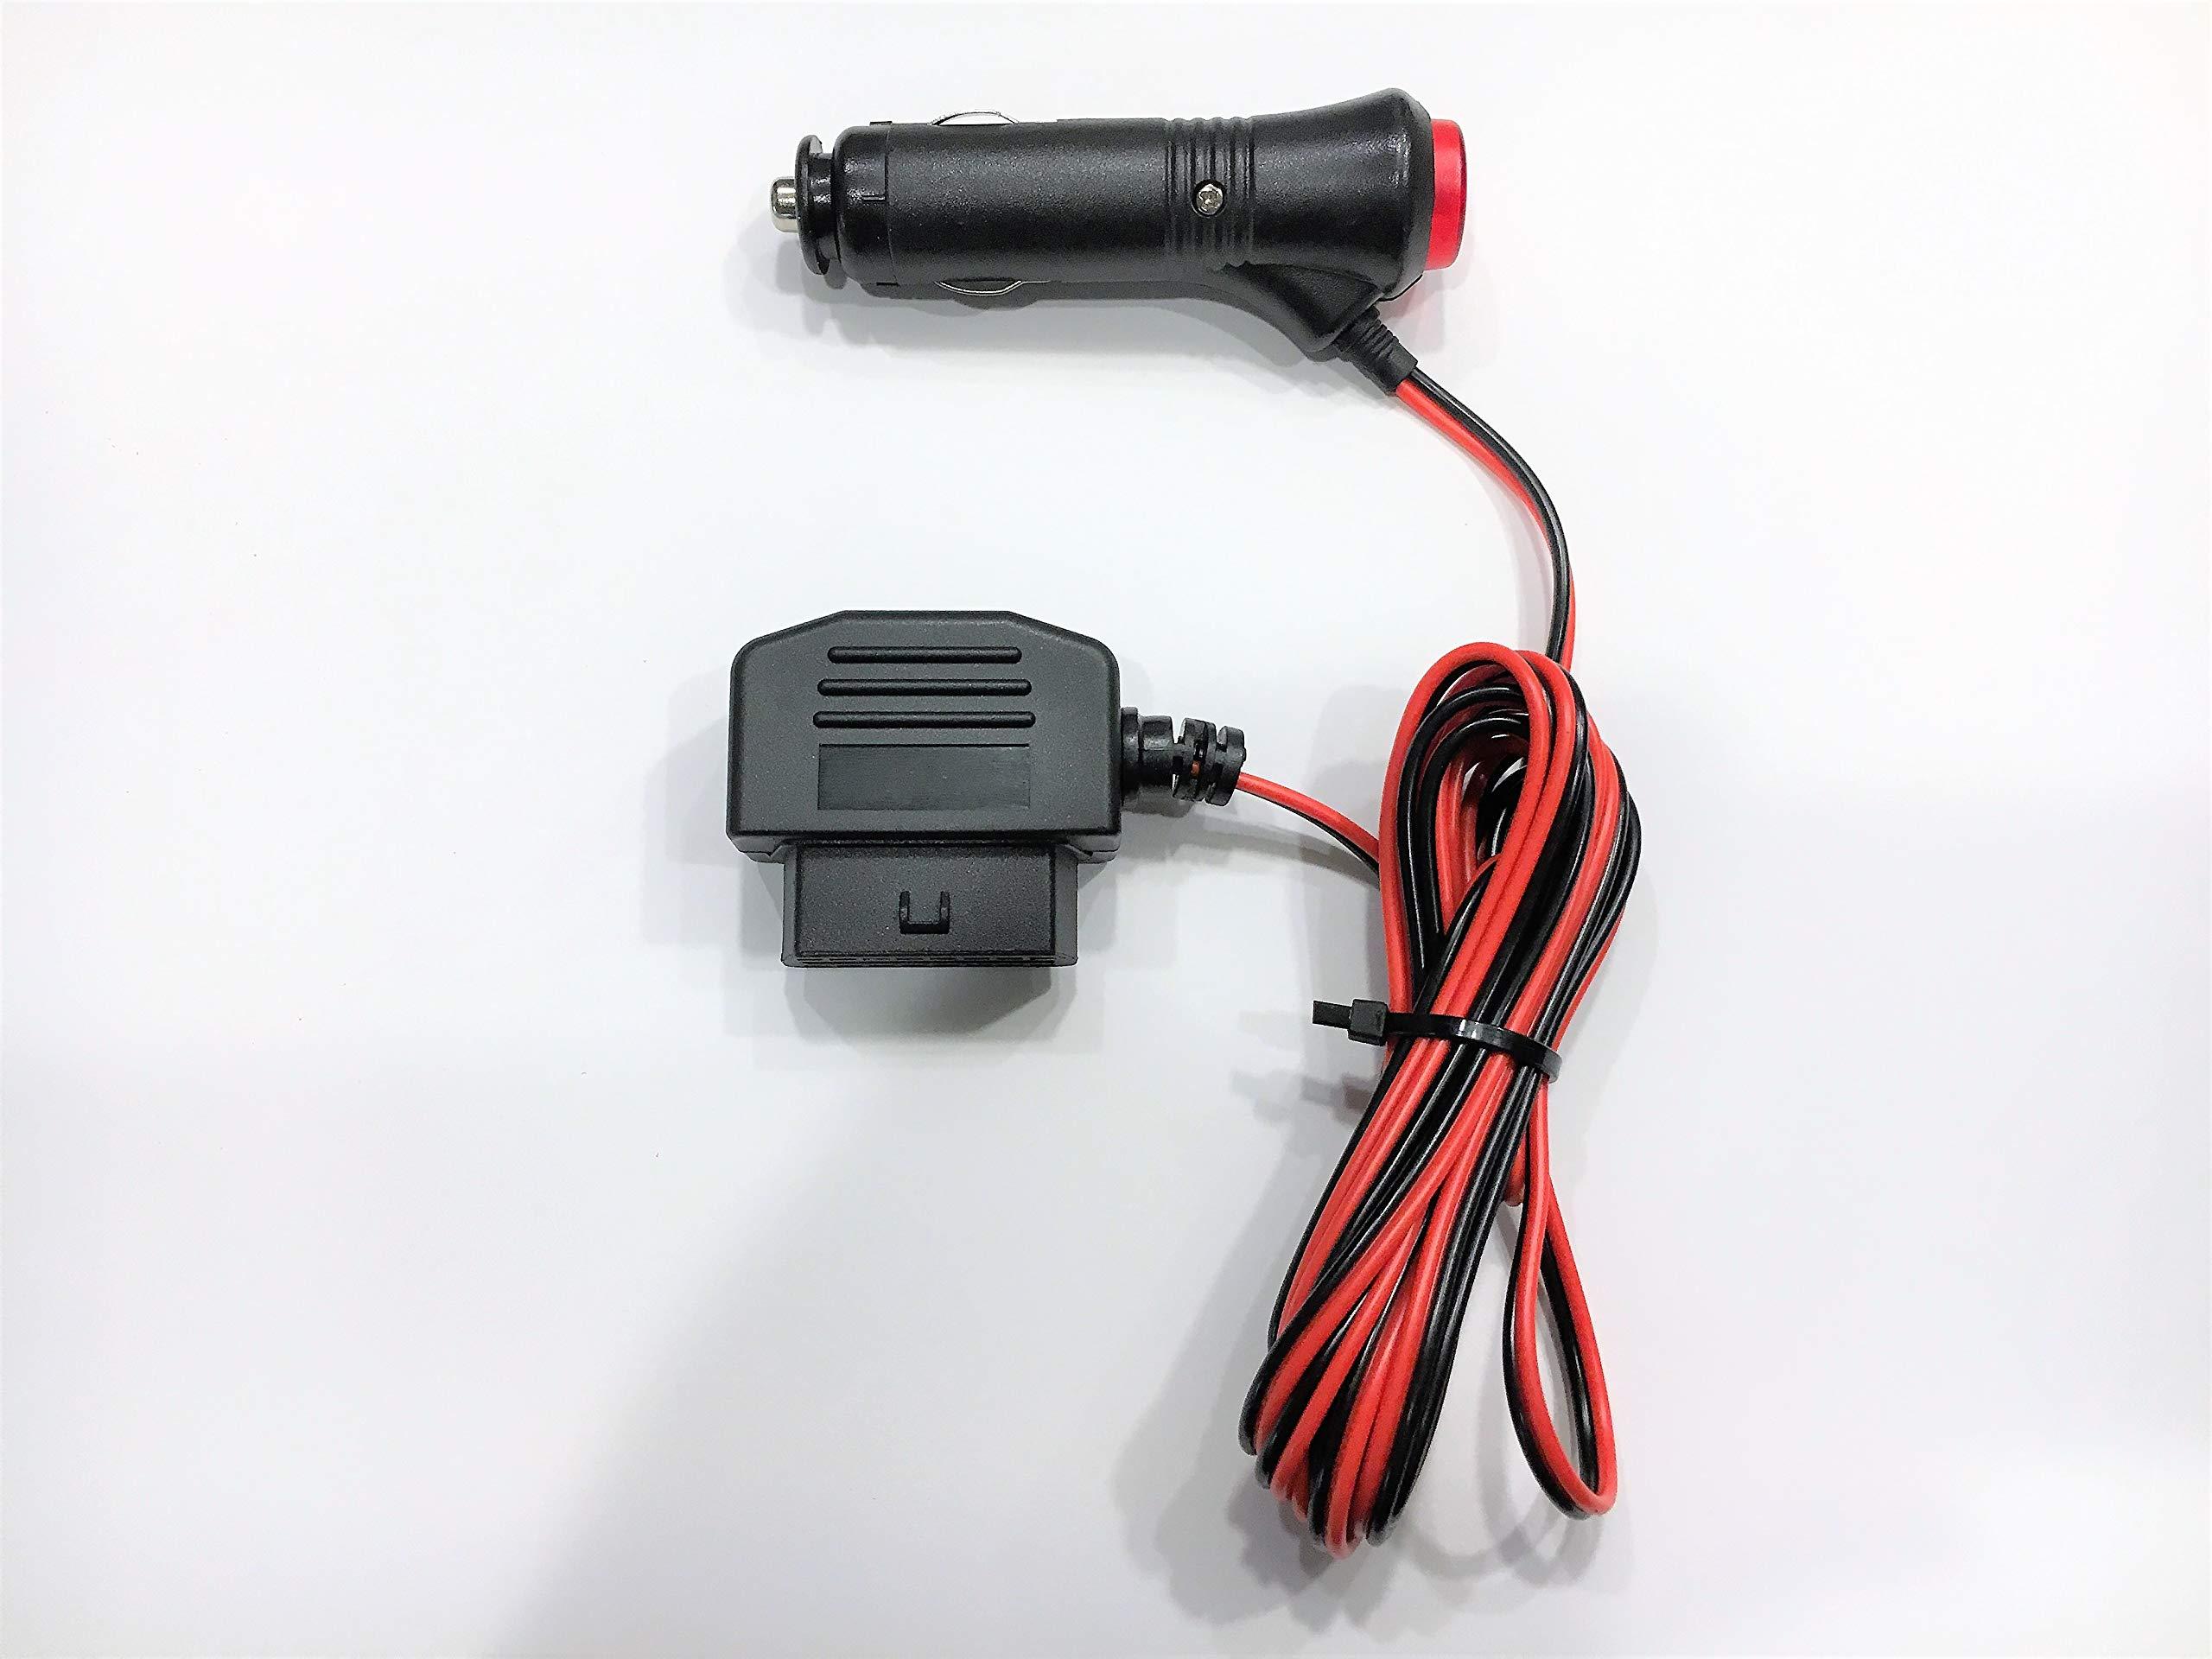 12v Car Plug Adapter for at&T ZTE Mobley LTE Hotspot by Vegajf